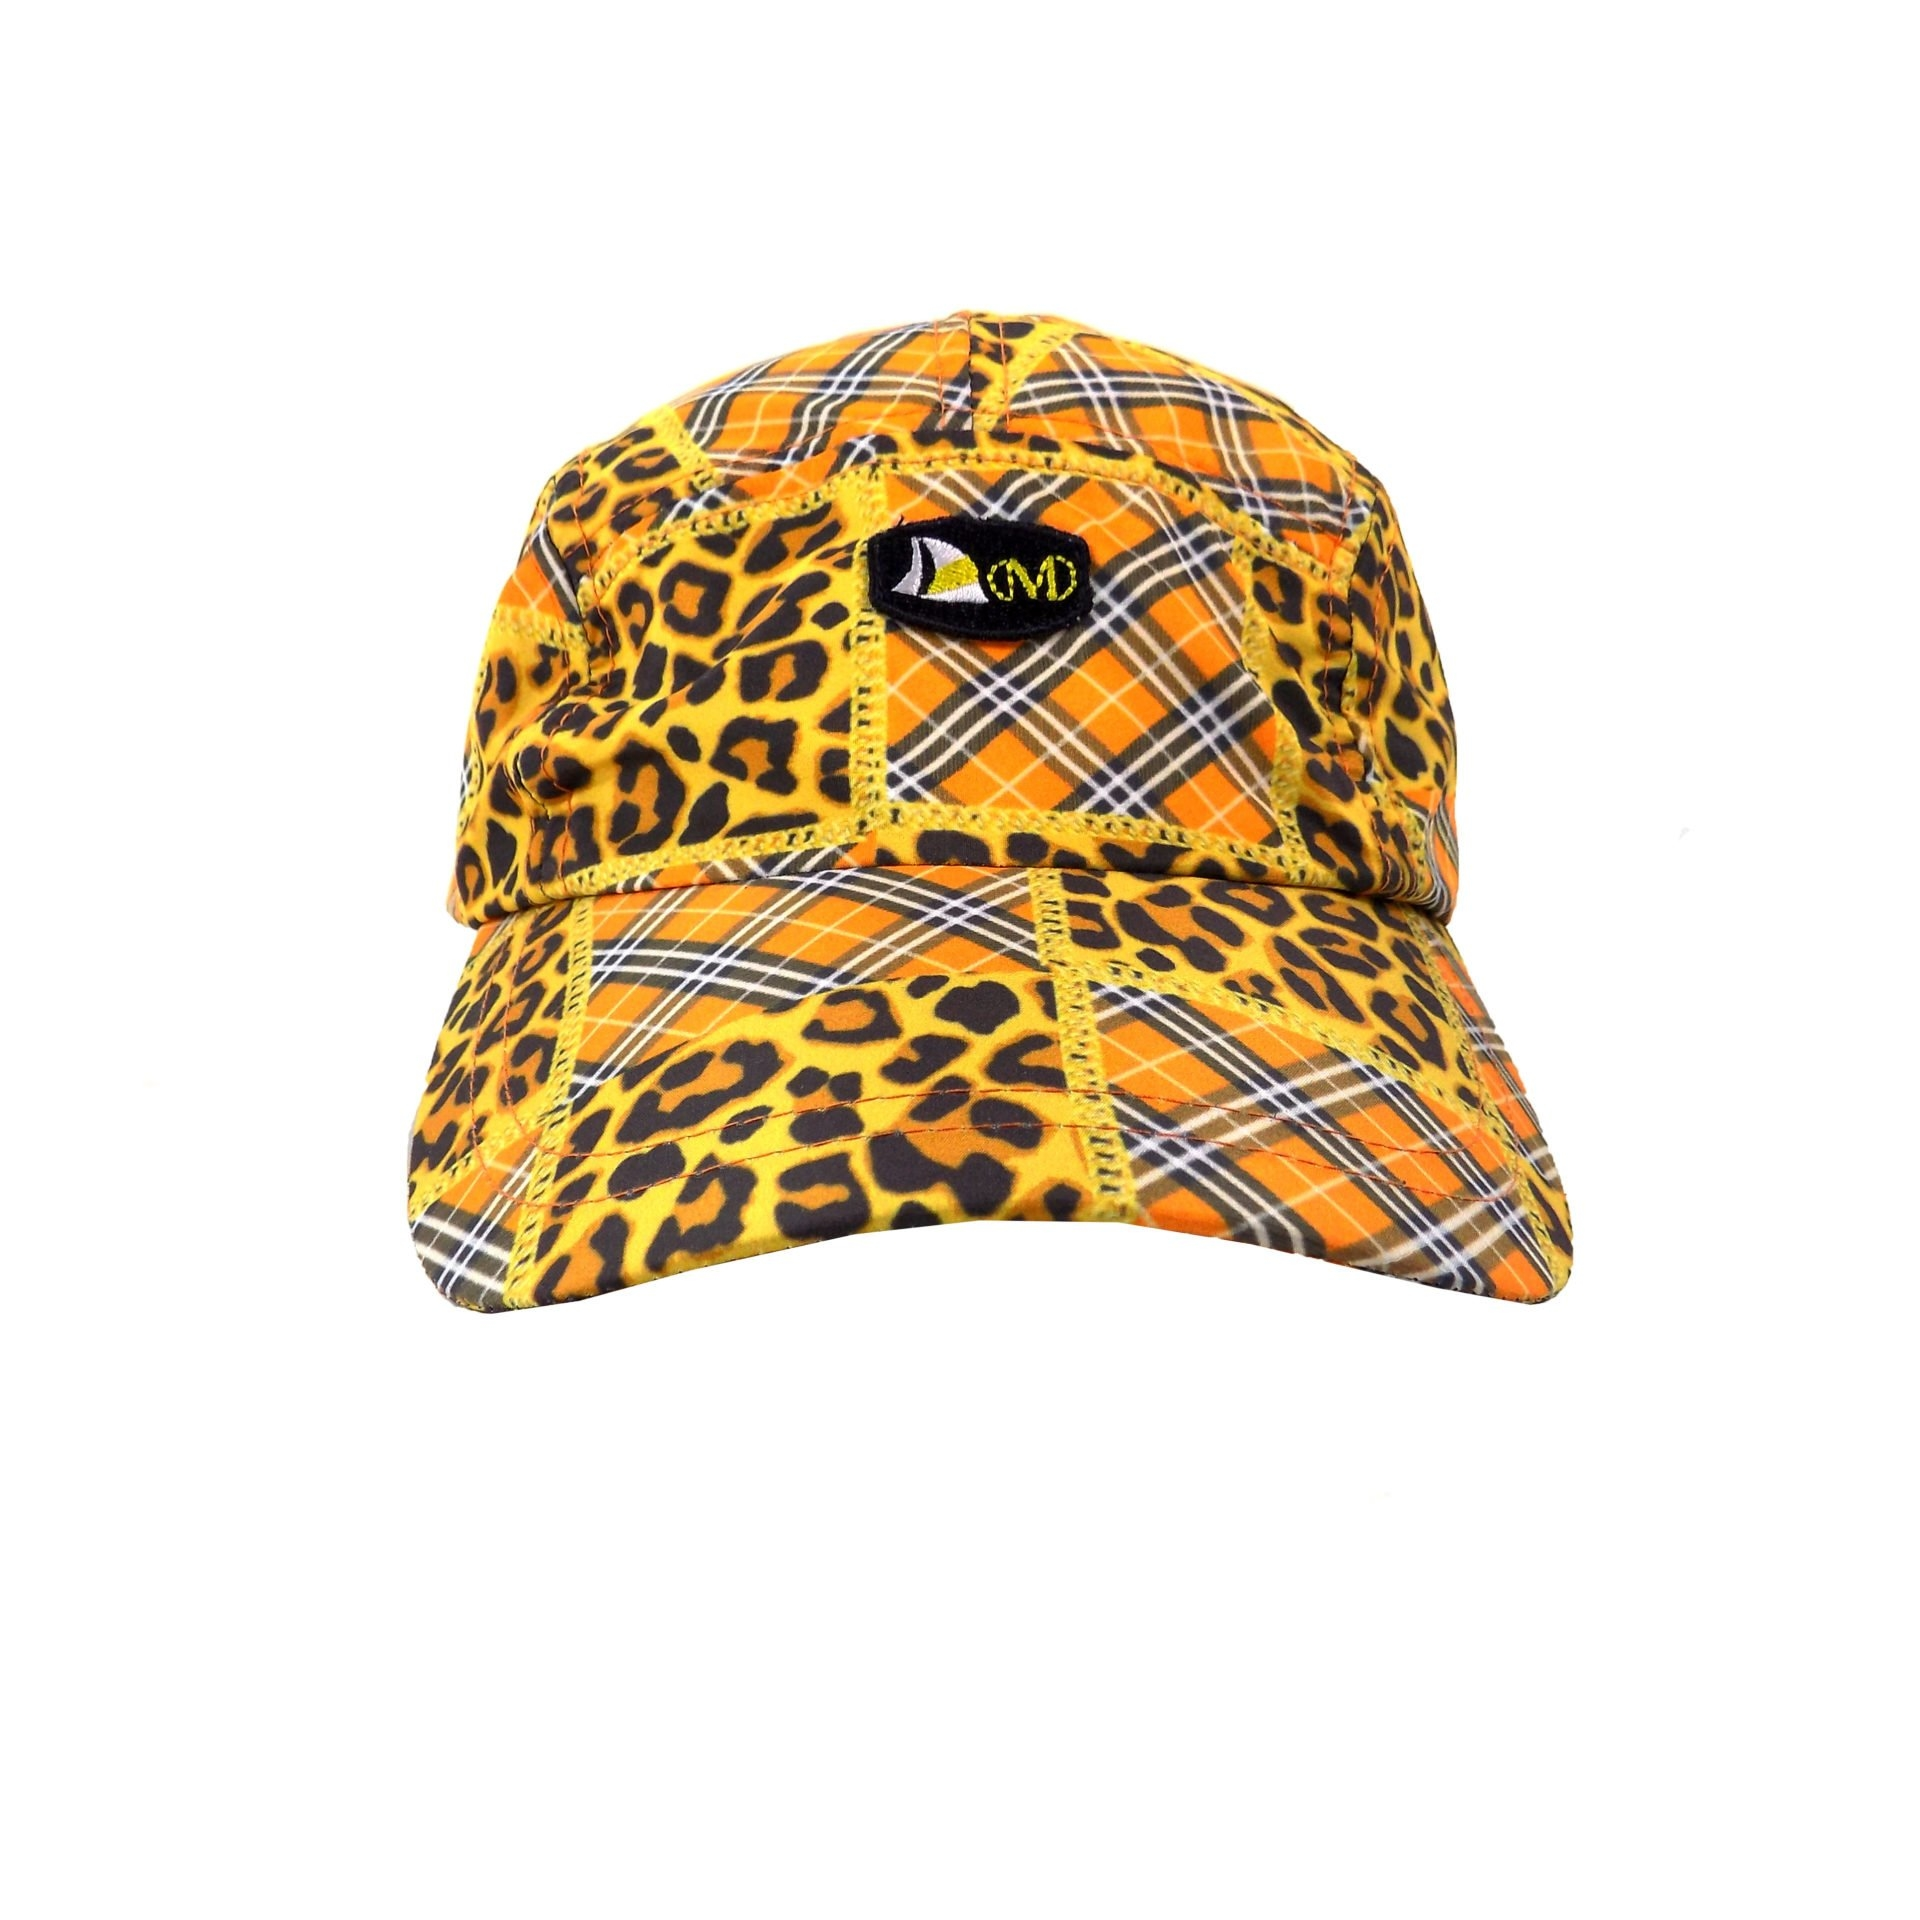 DSCN  - DMD ORANGE LEOPARD PRINT CAP